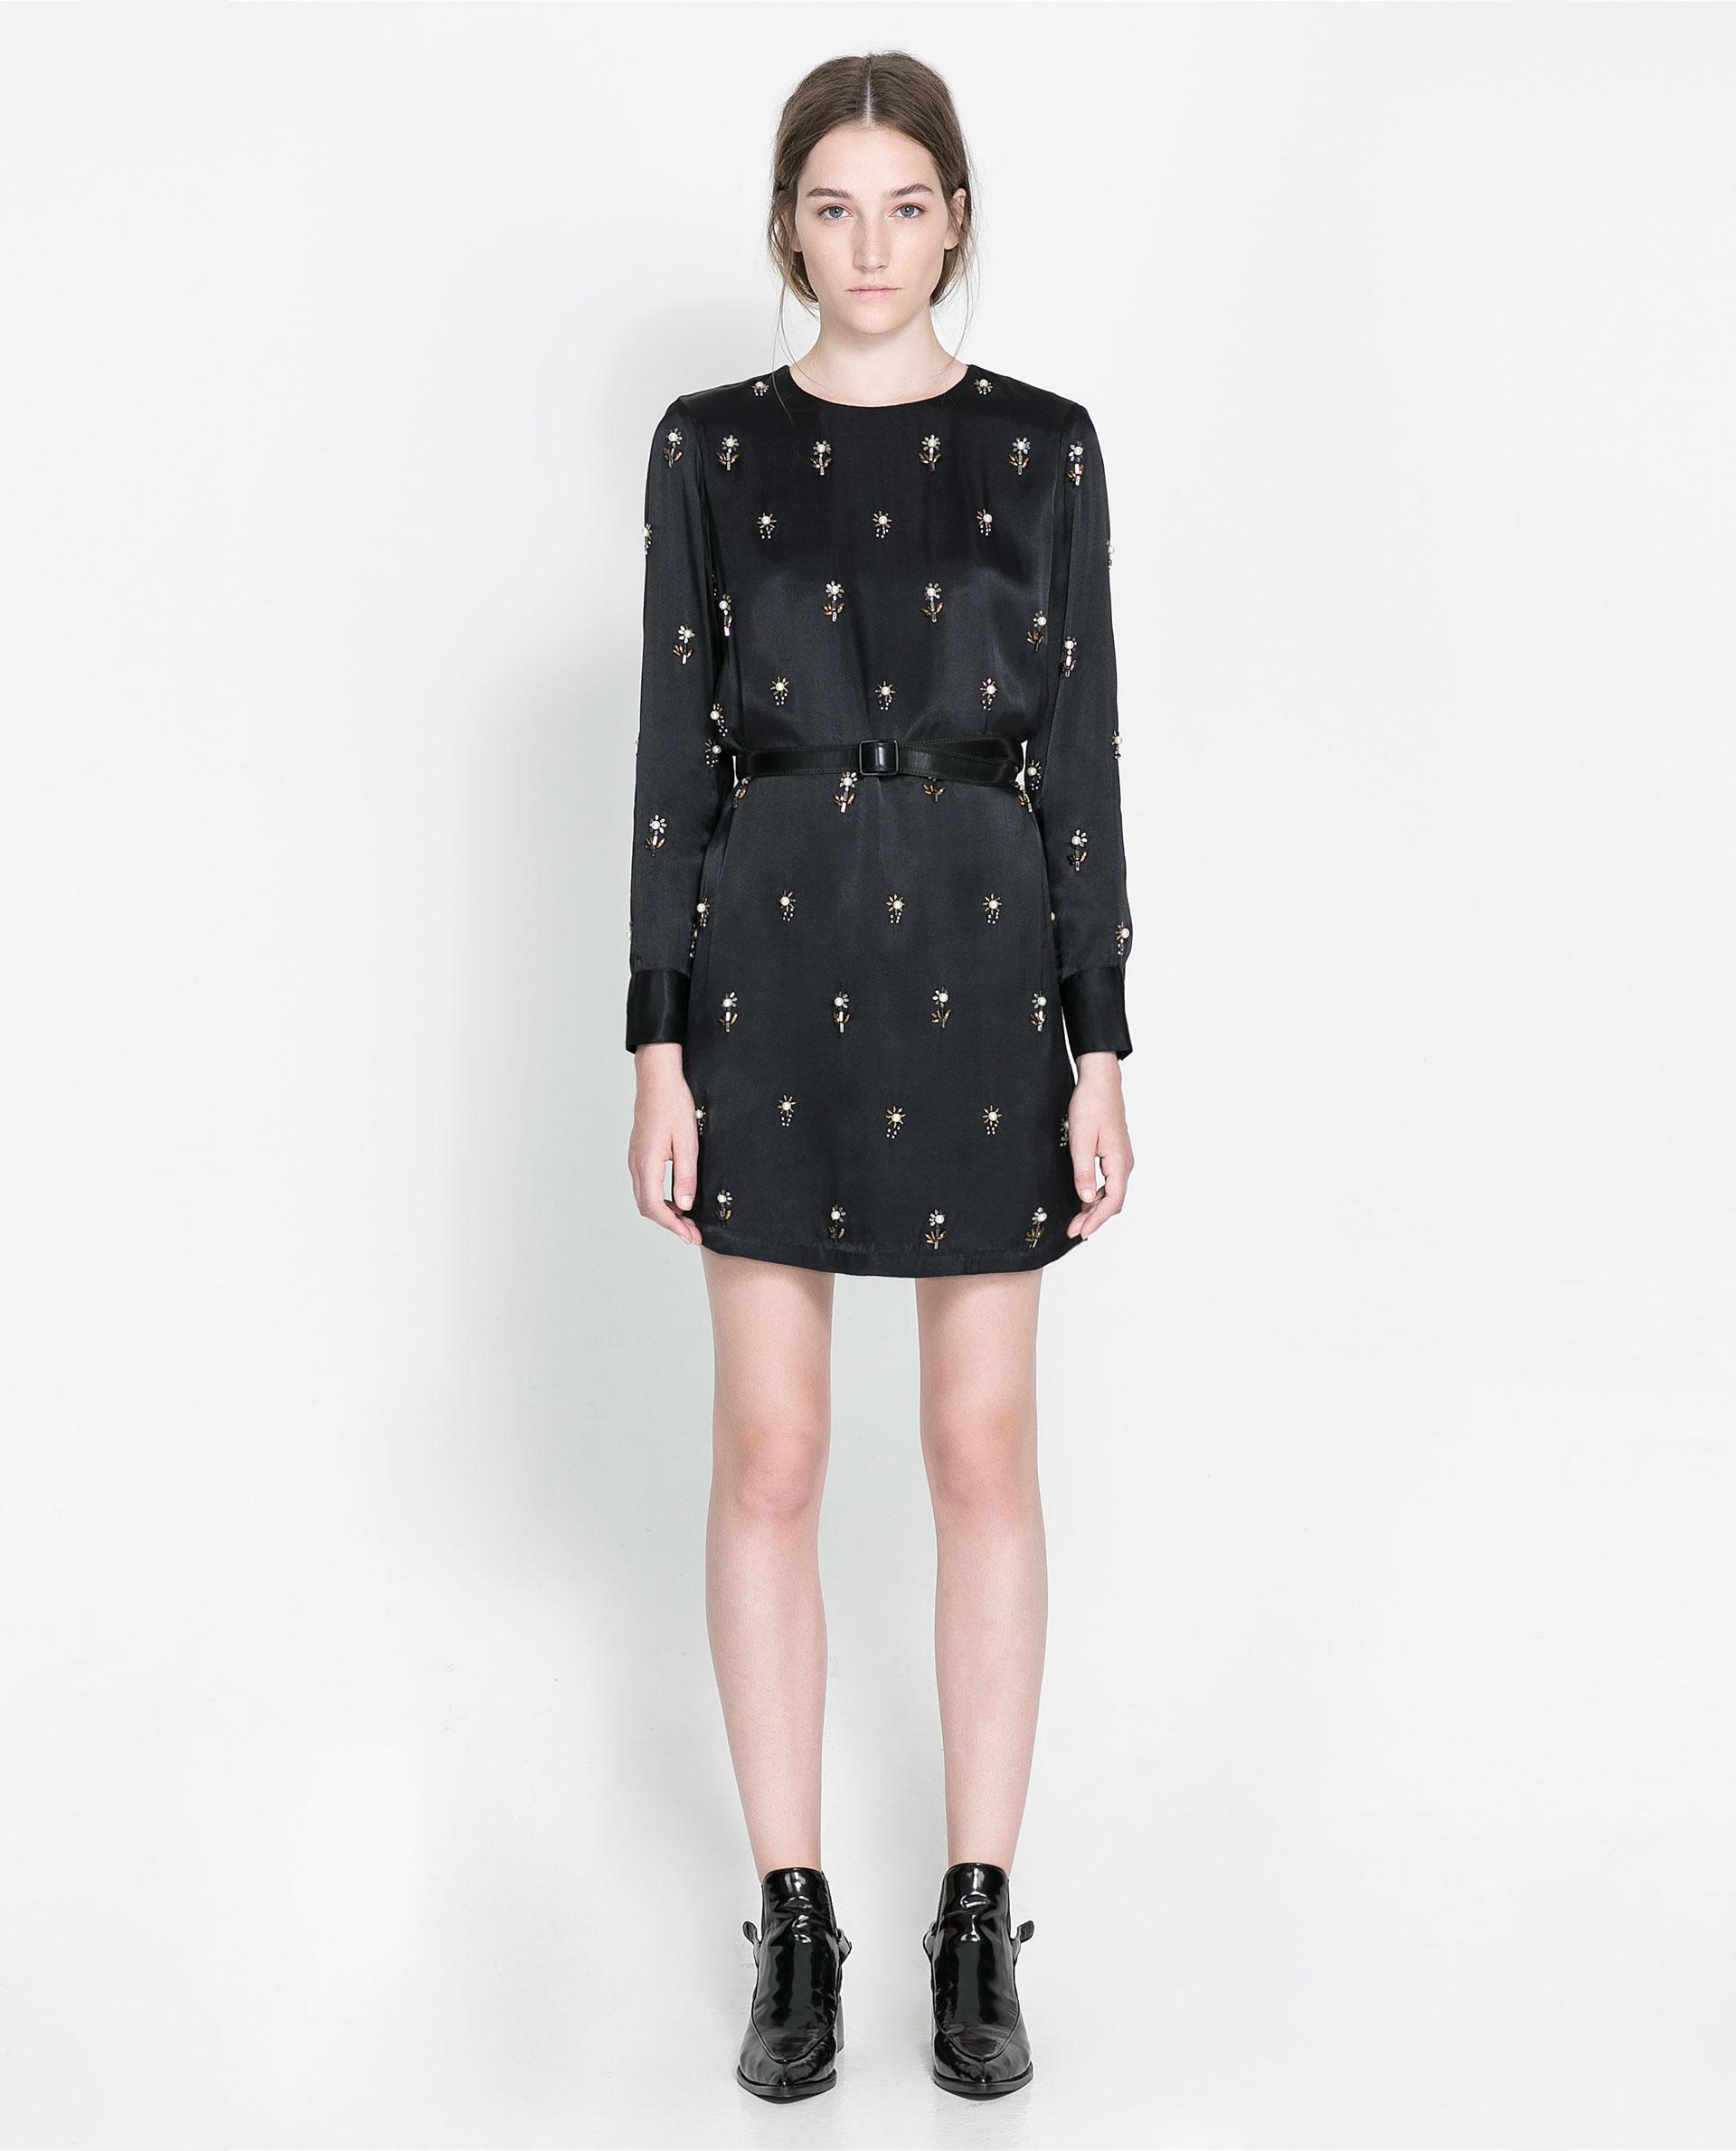 Zara Embroidered Satin Dress In Black   Lyst